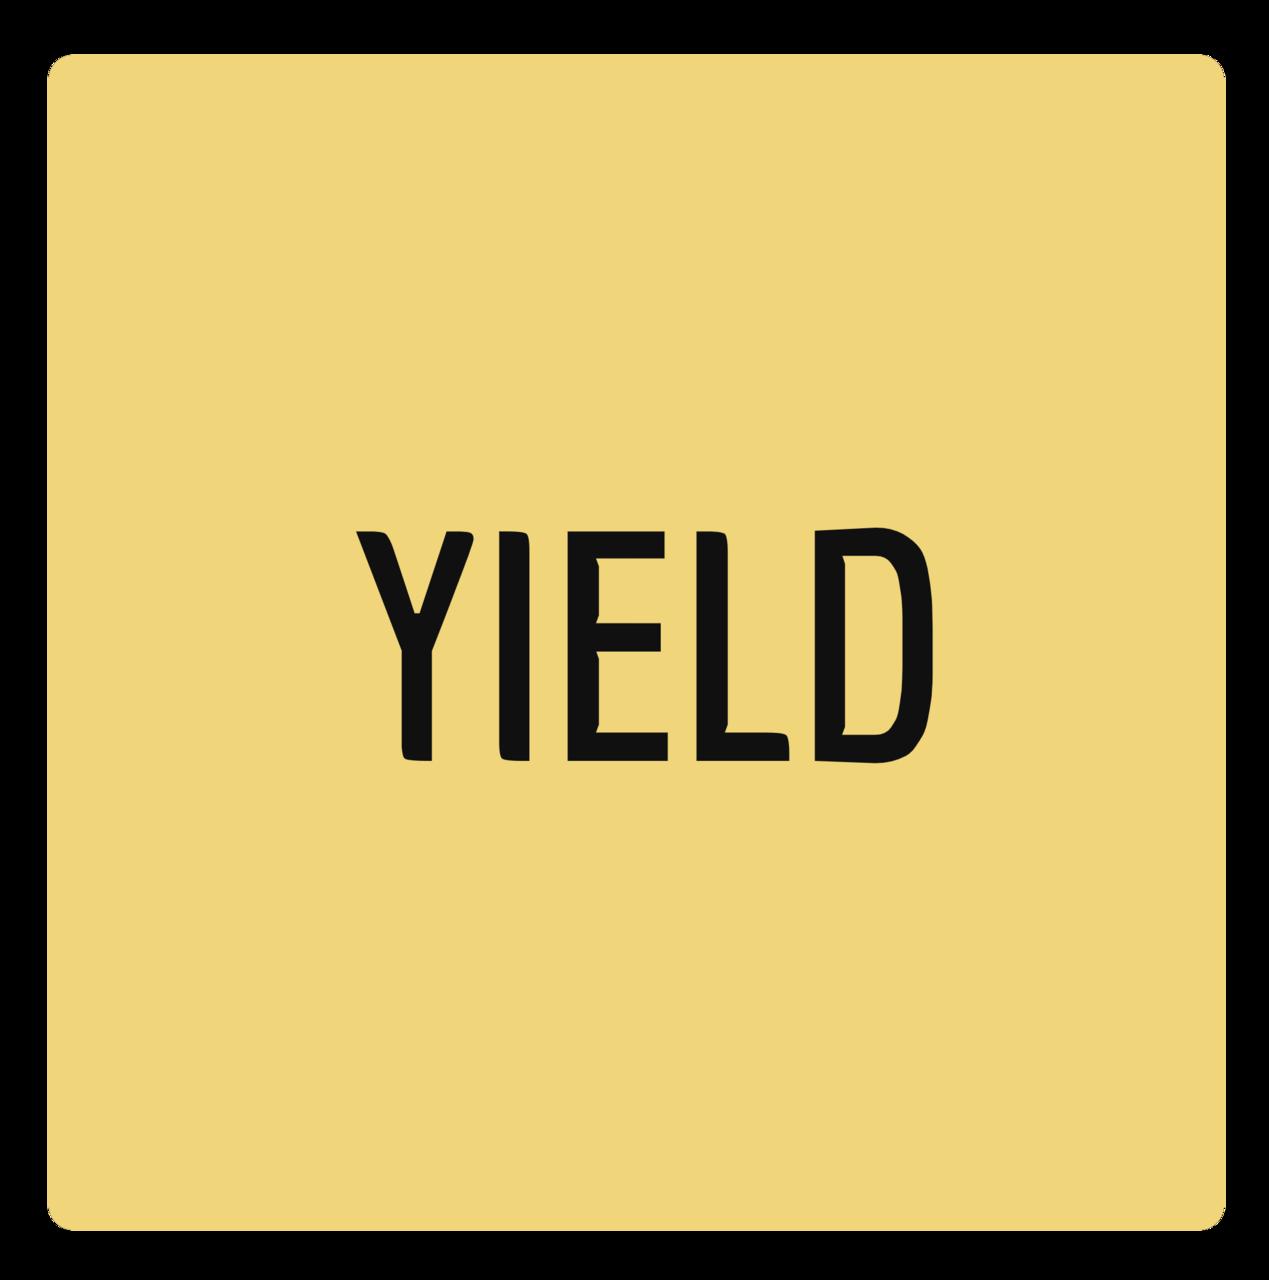 YIELD Magazine